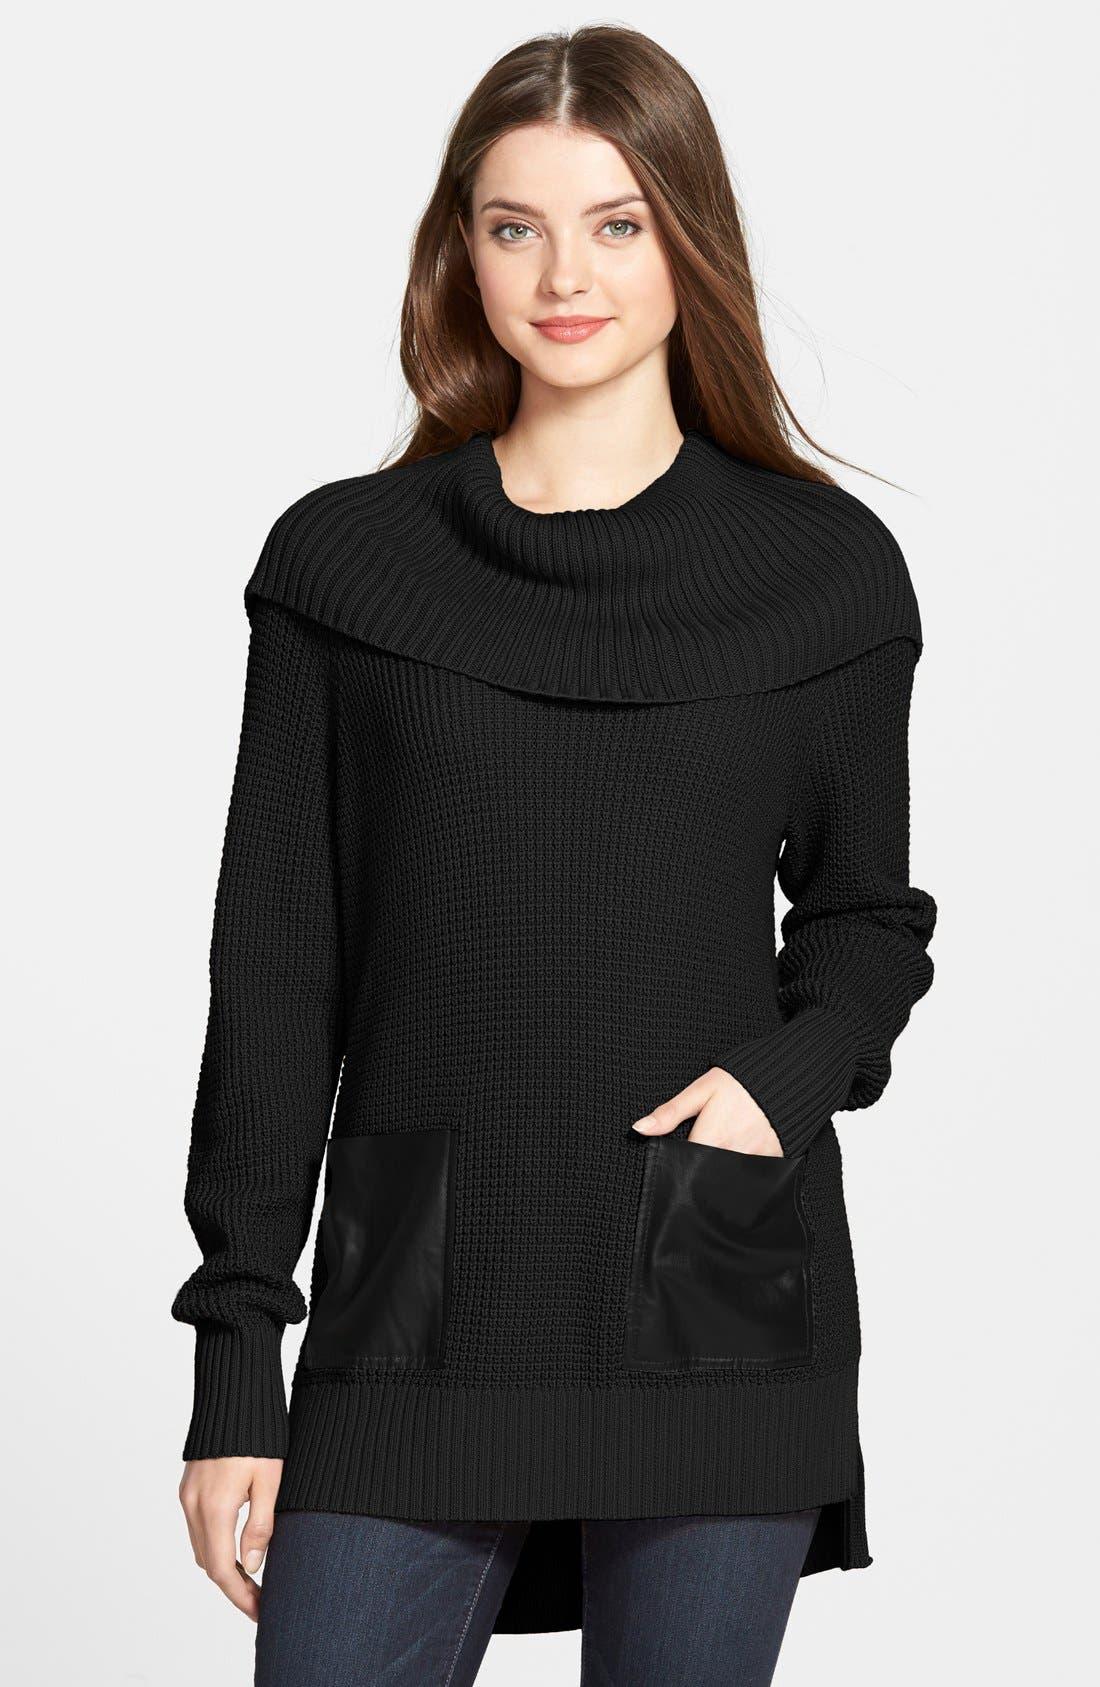 MICHAEL MICHAEL KORS Faux Leather Pocket Cowl Neck Sweater, Main, color, 001